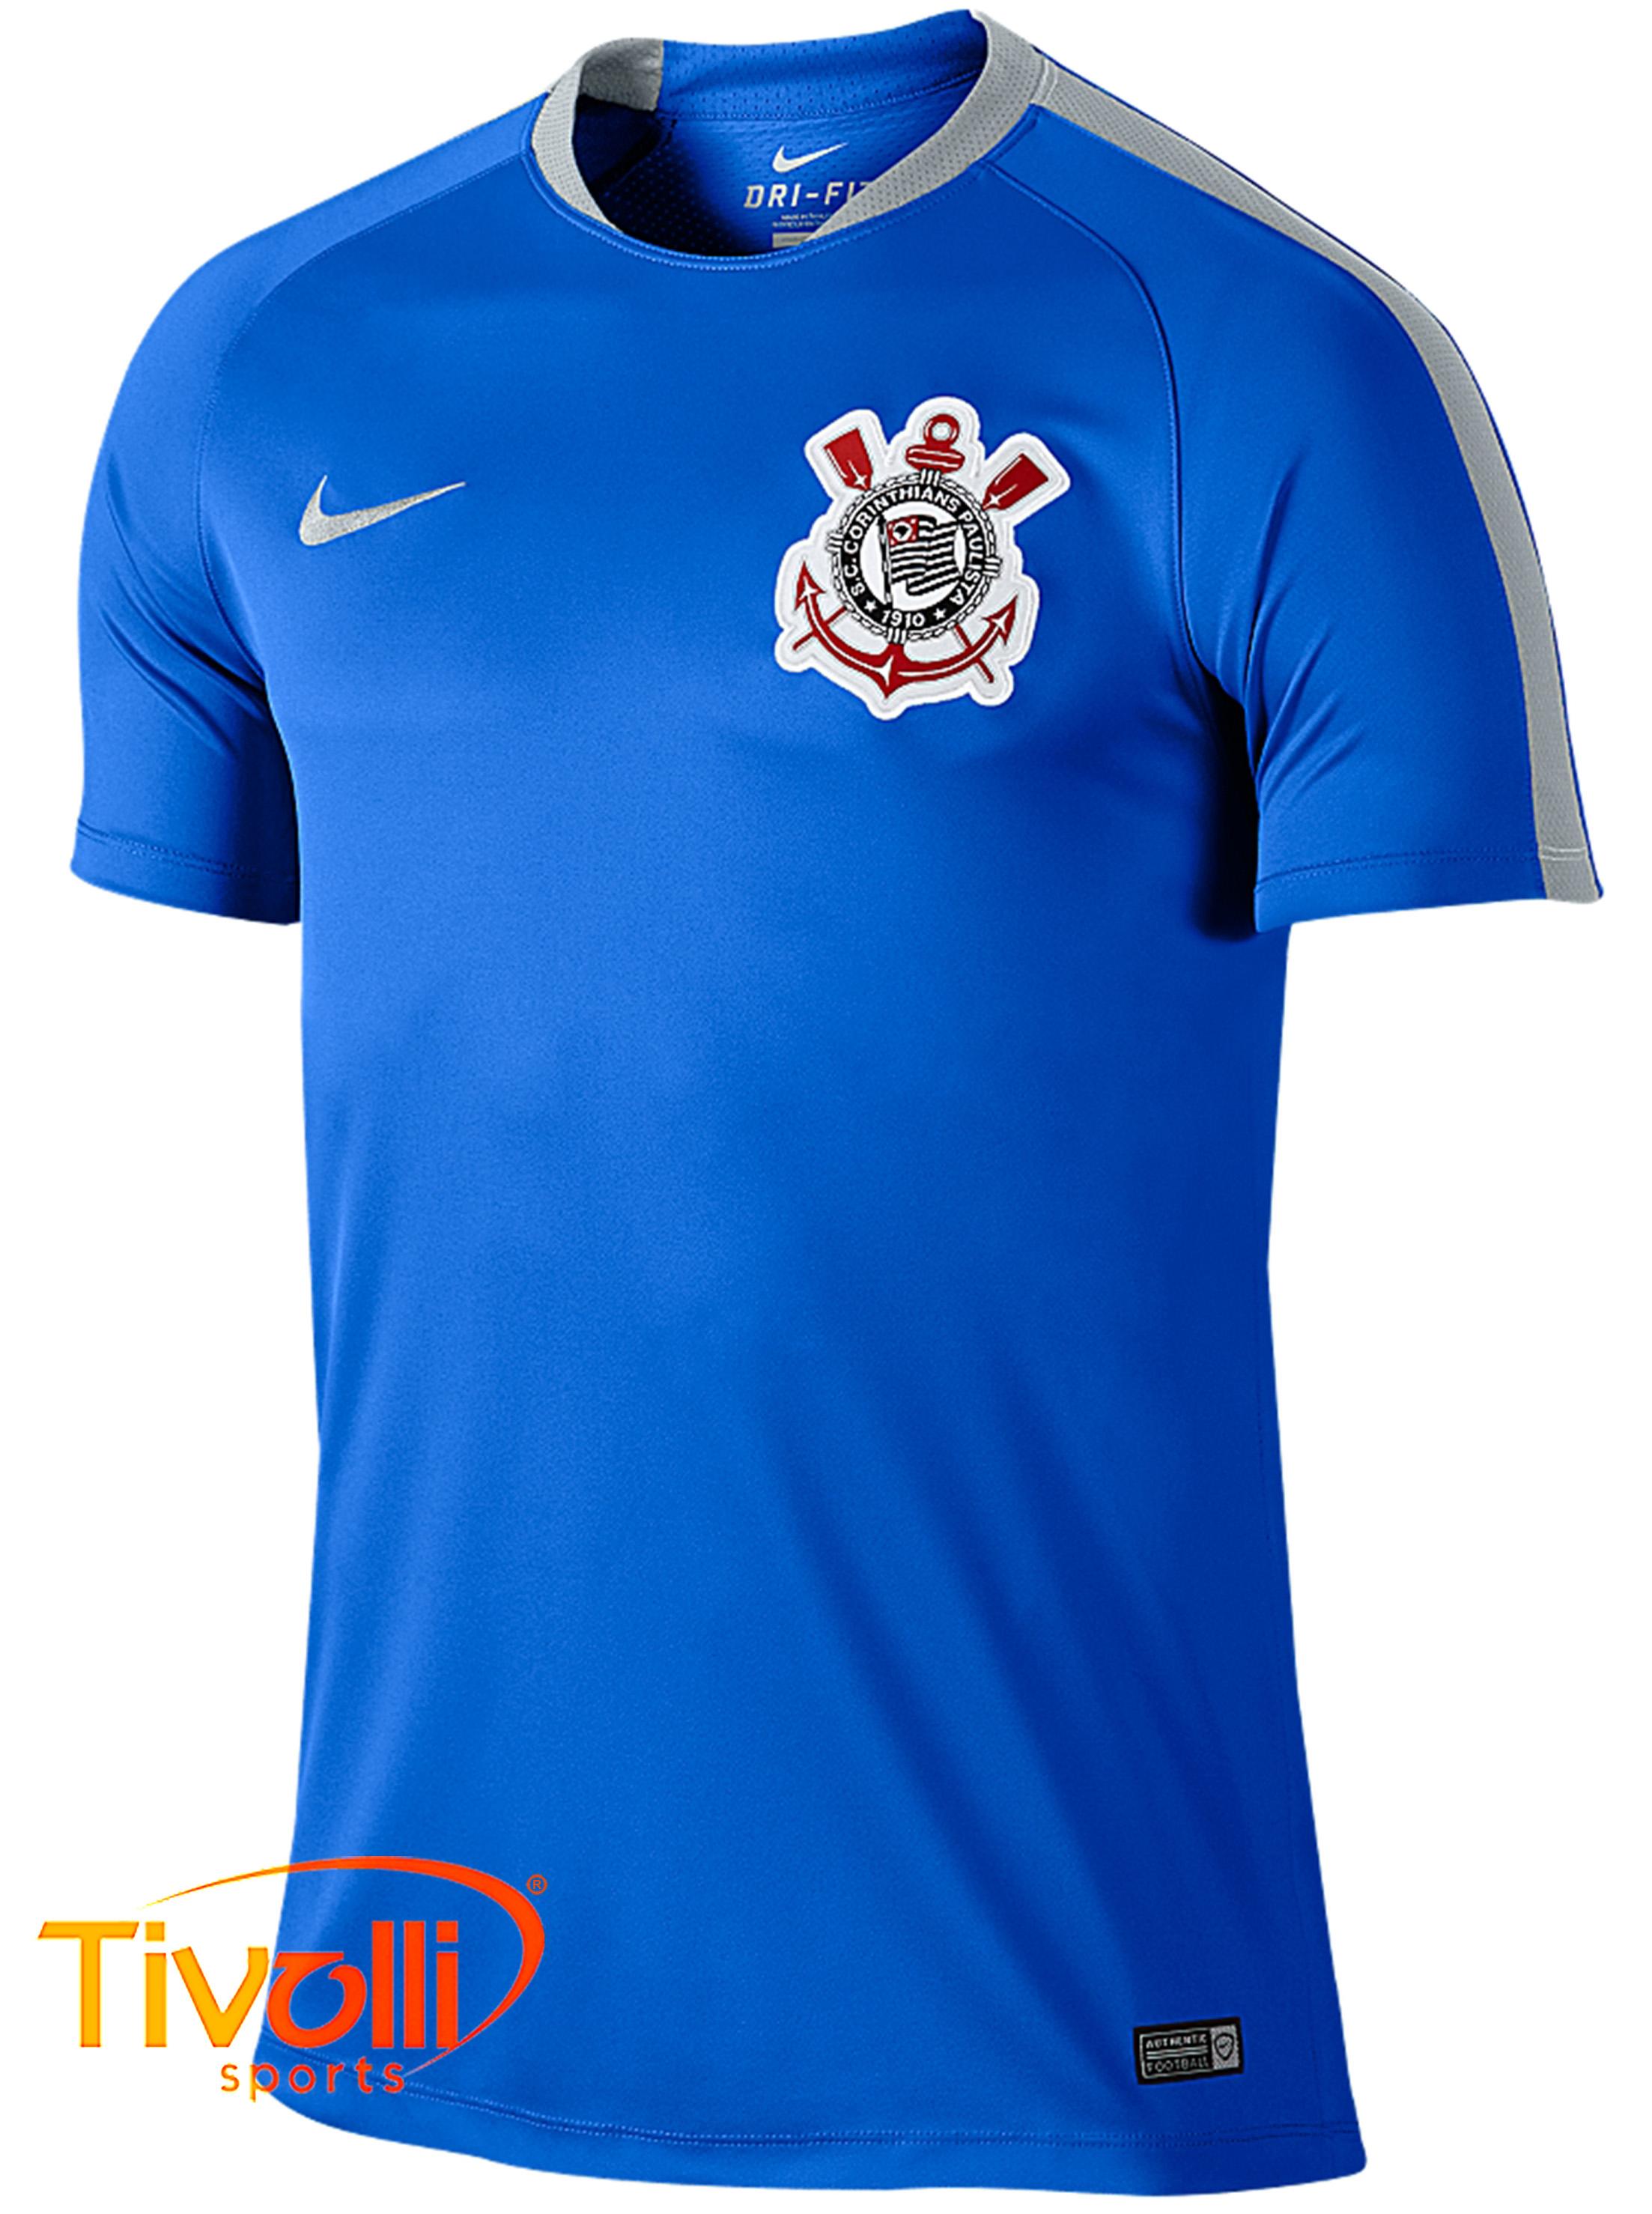 Camisa Corinthians SCCP Flash Nike   azul e cinza   9abff9a80c649